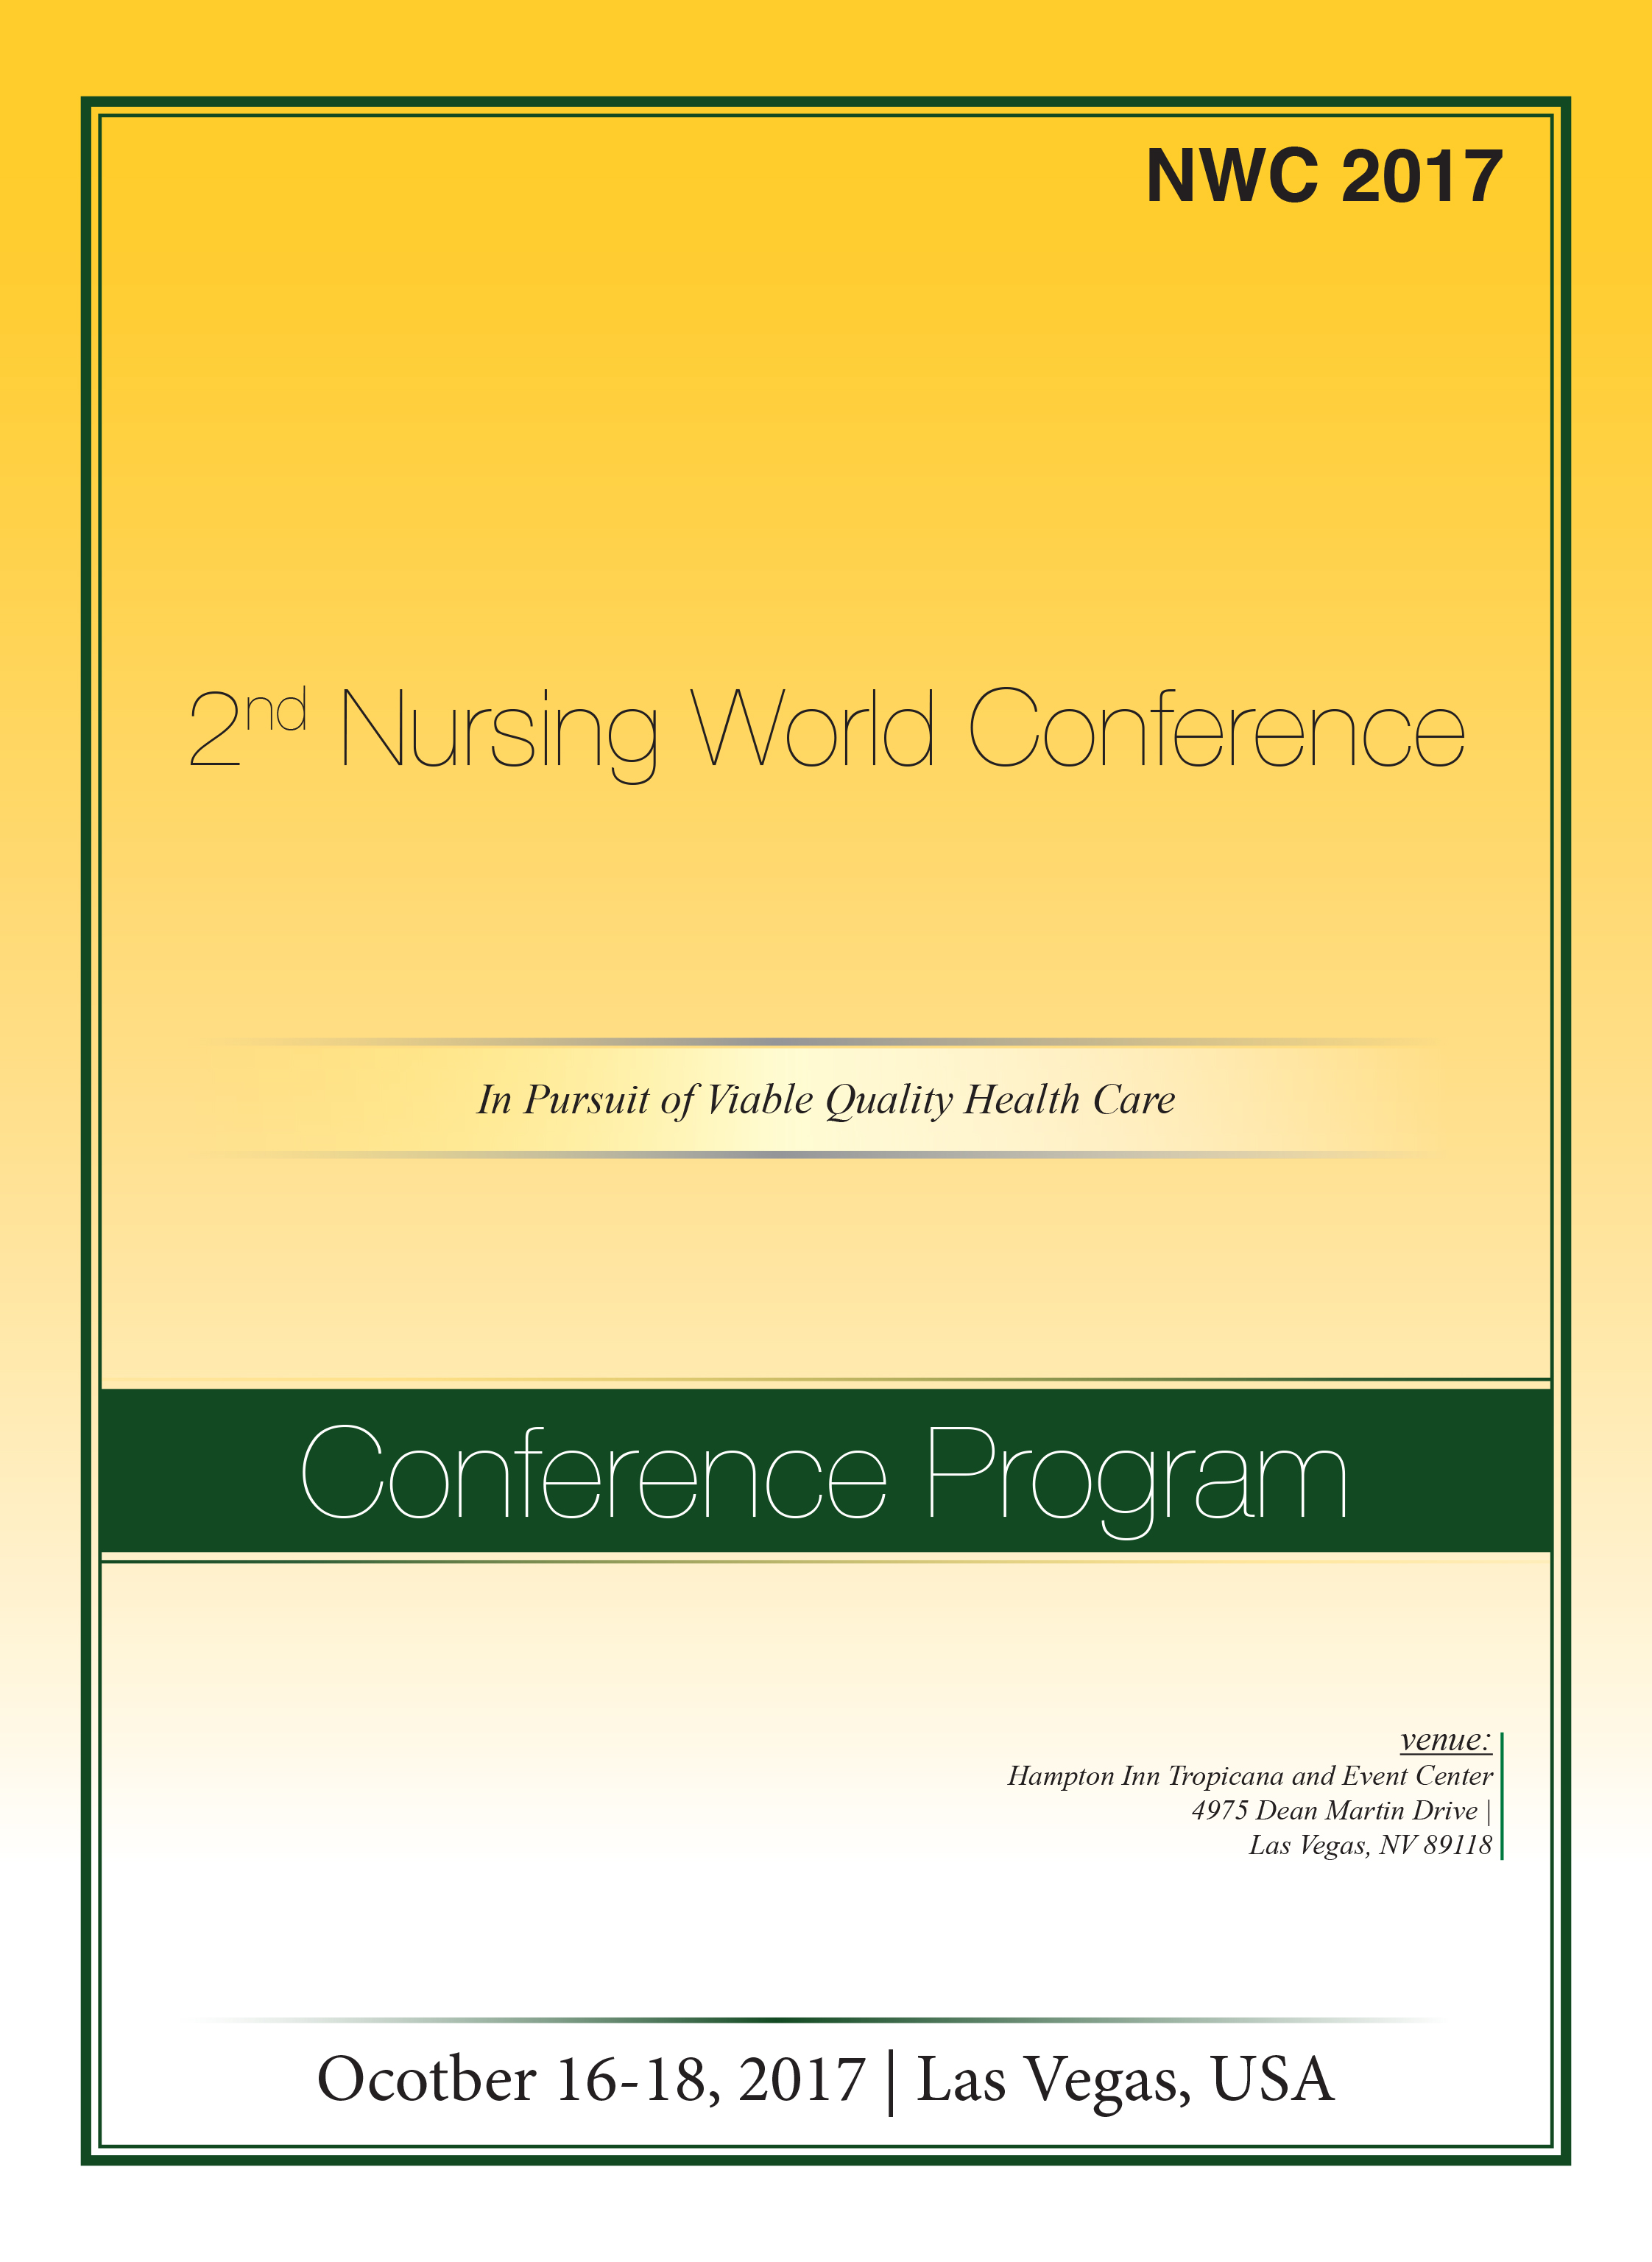 2nd Nursing World Conference | Las Vegas, USA Program